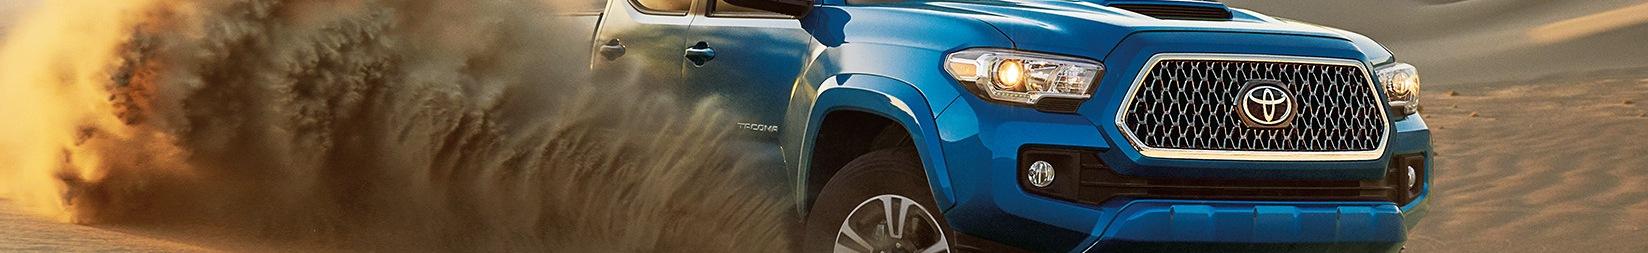 toyota-2018-tacoma-4x4-double-cab-V6-trd-sport-blazing-blue-metallic-l